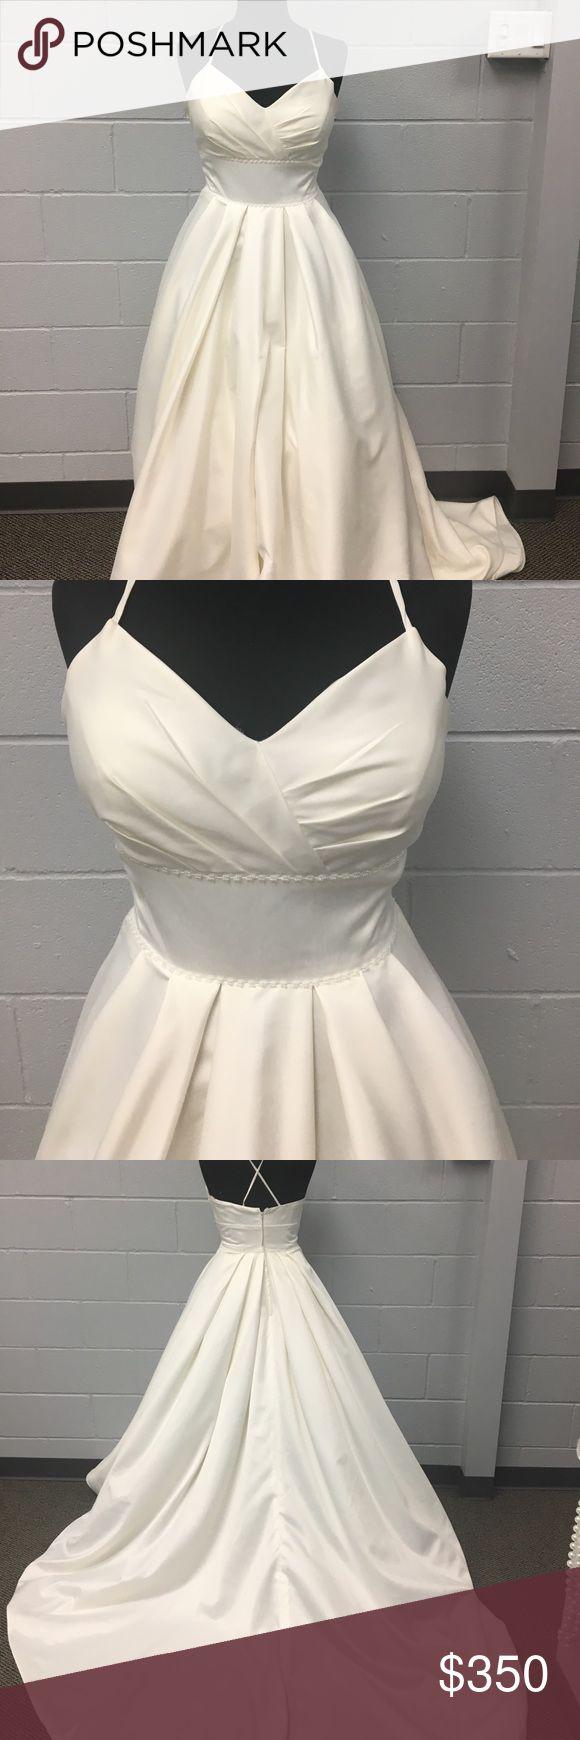 DaVinci Wedding Gown DaVinci Ivory Satin wedding dress! V neck ball gown. Measurements are bust 39.5, waist 31.5, hips 43.5 DaVinci Dresses Wedding